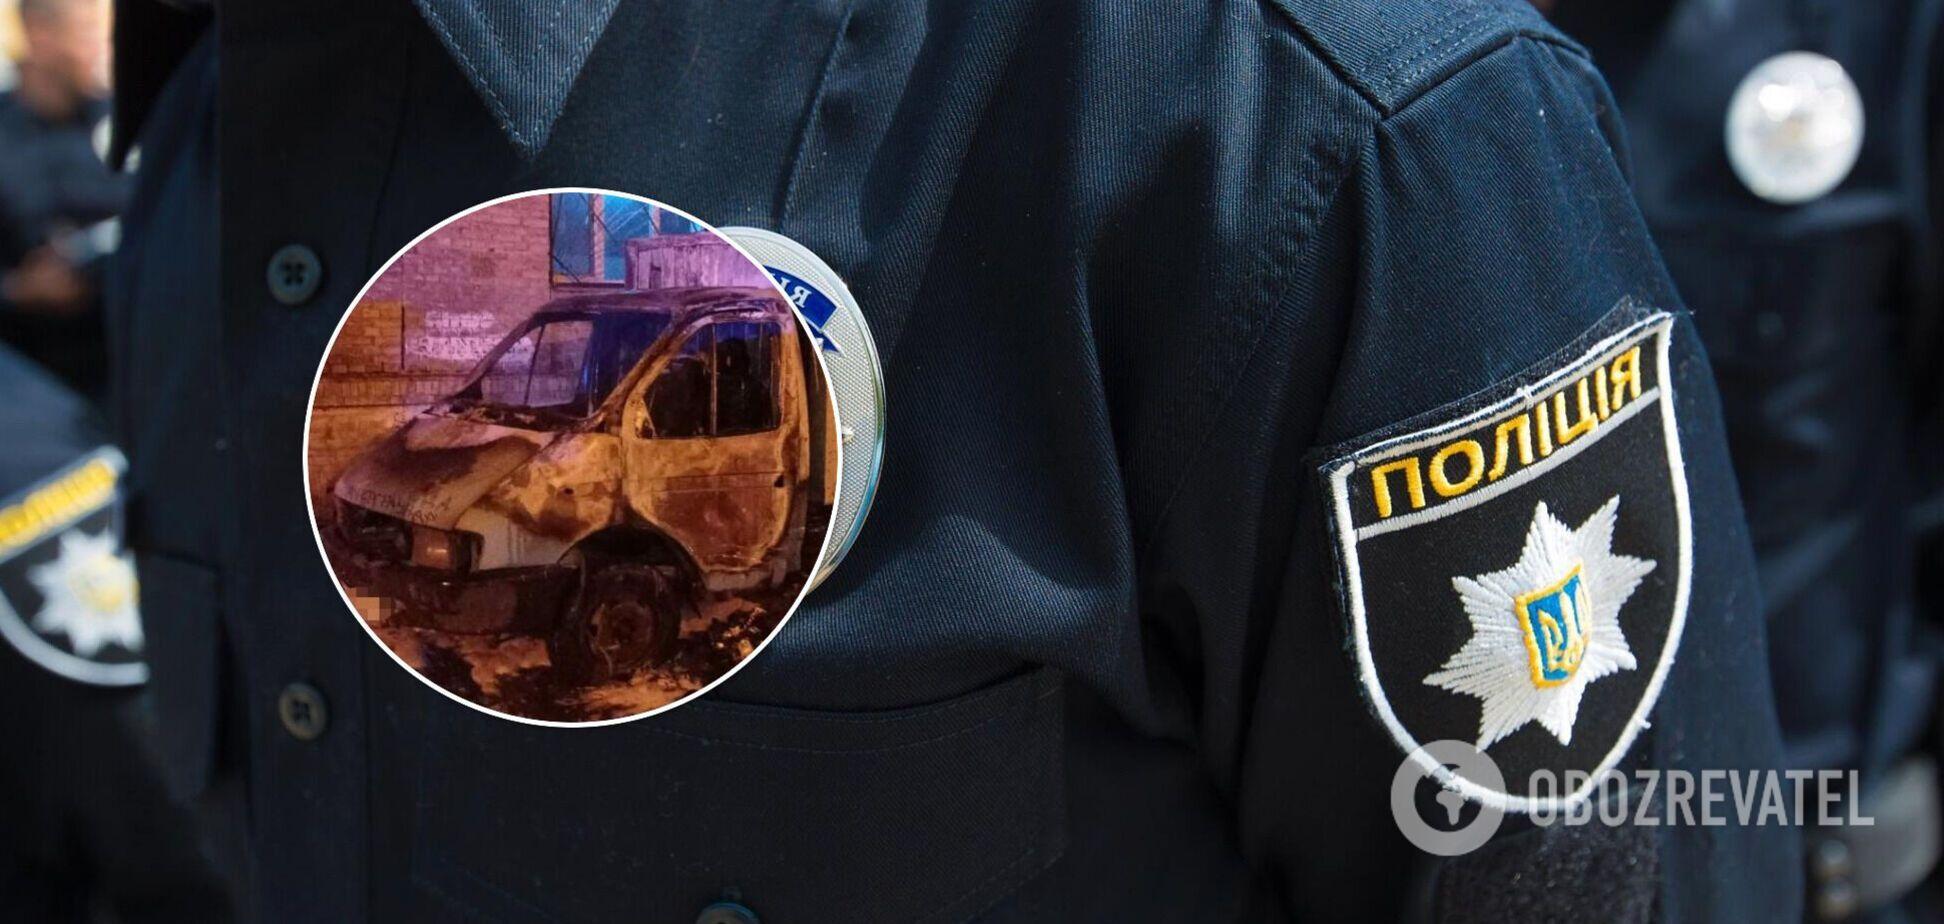 Инцидент произошел на улице Ольжича